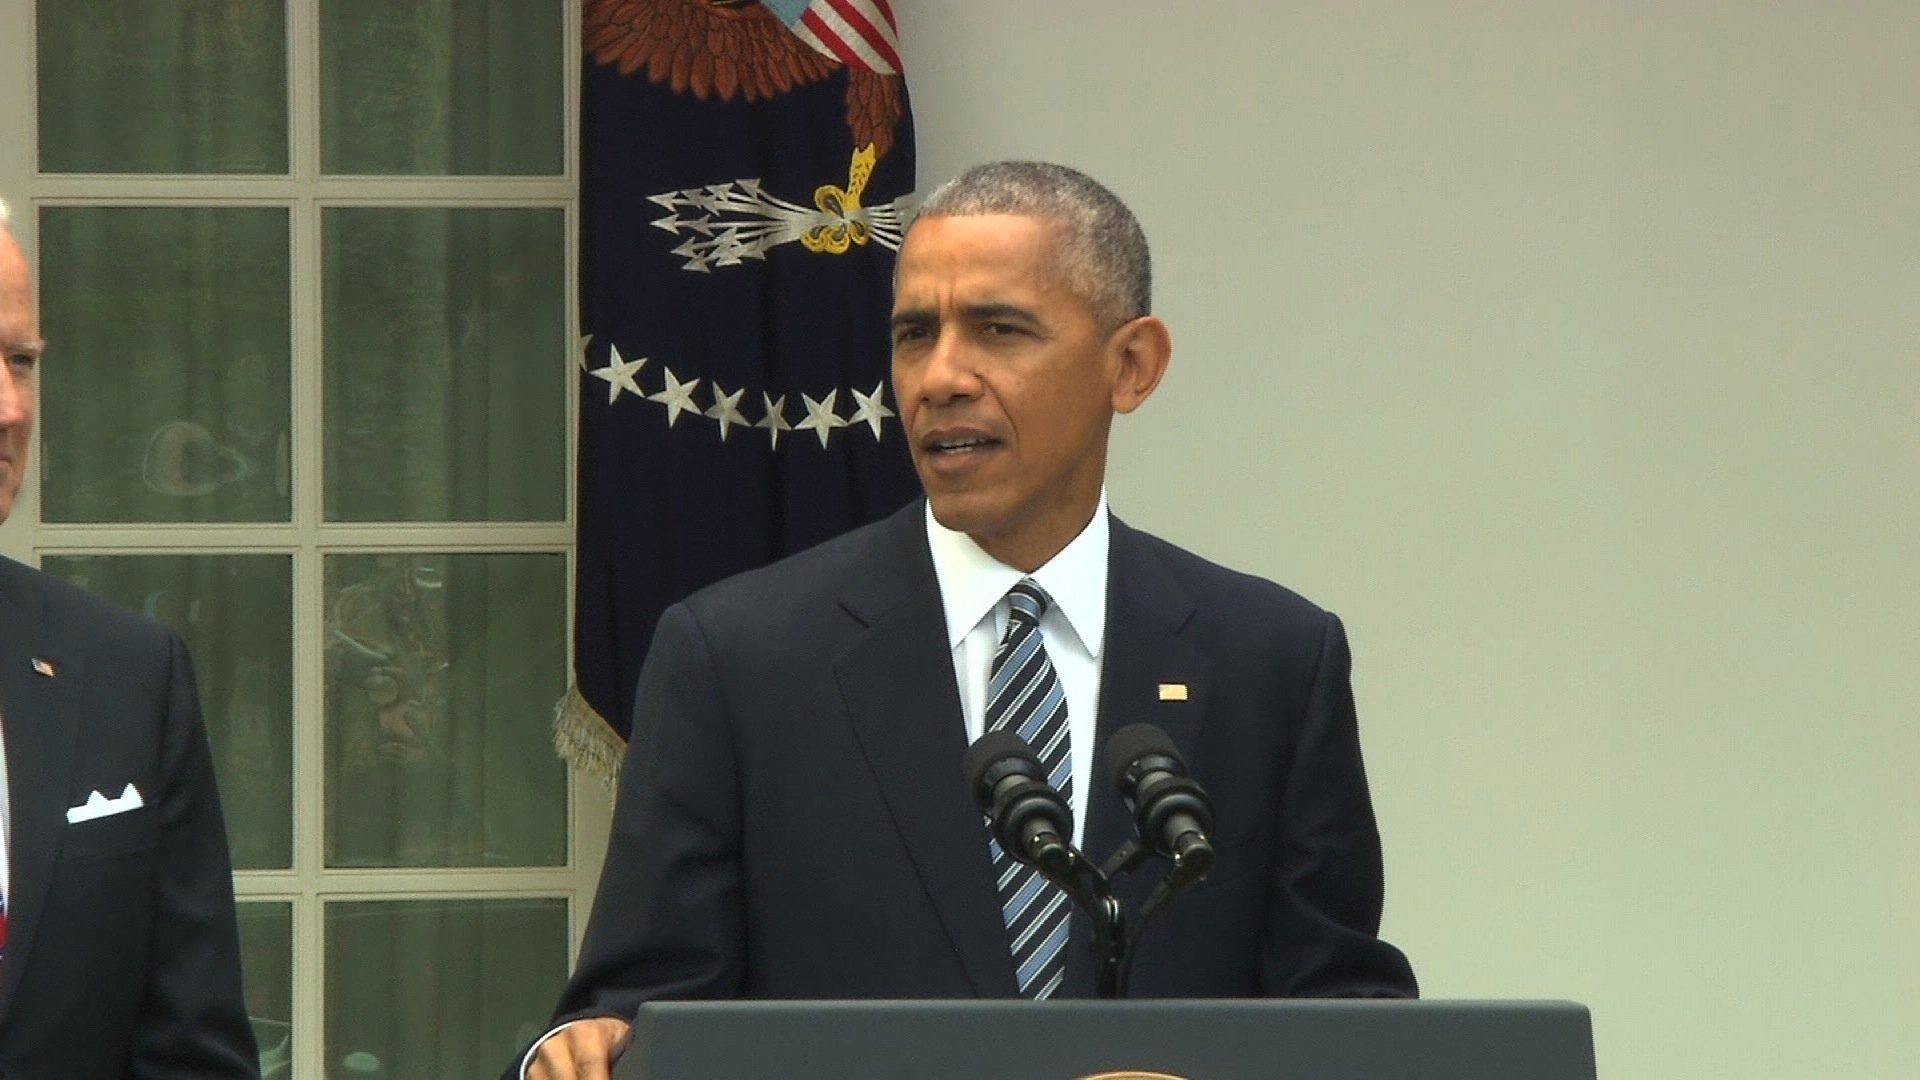 Obama honours NBA champion Cleveland Cavaliers